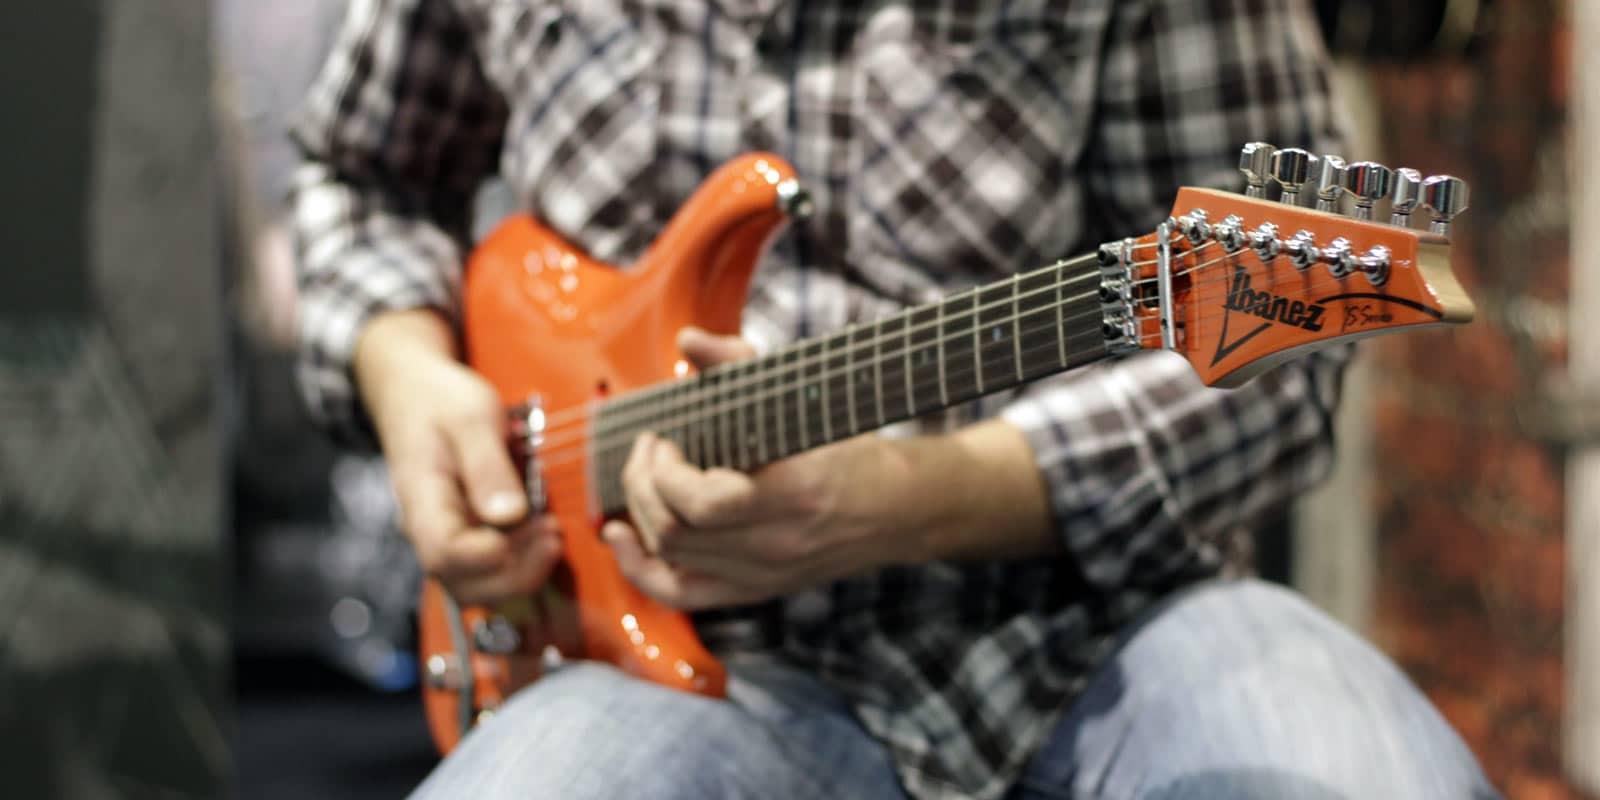 New Ibanez JS2410 Prestige Joe Satriani signature